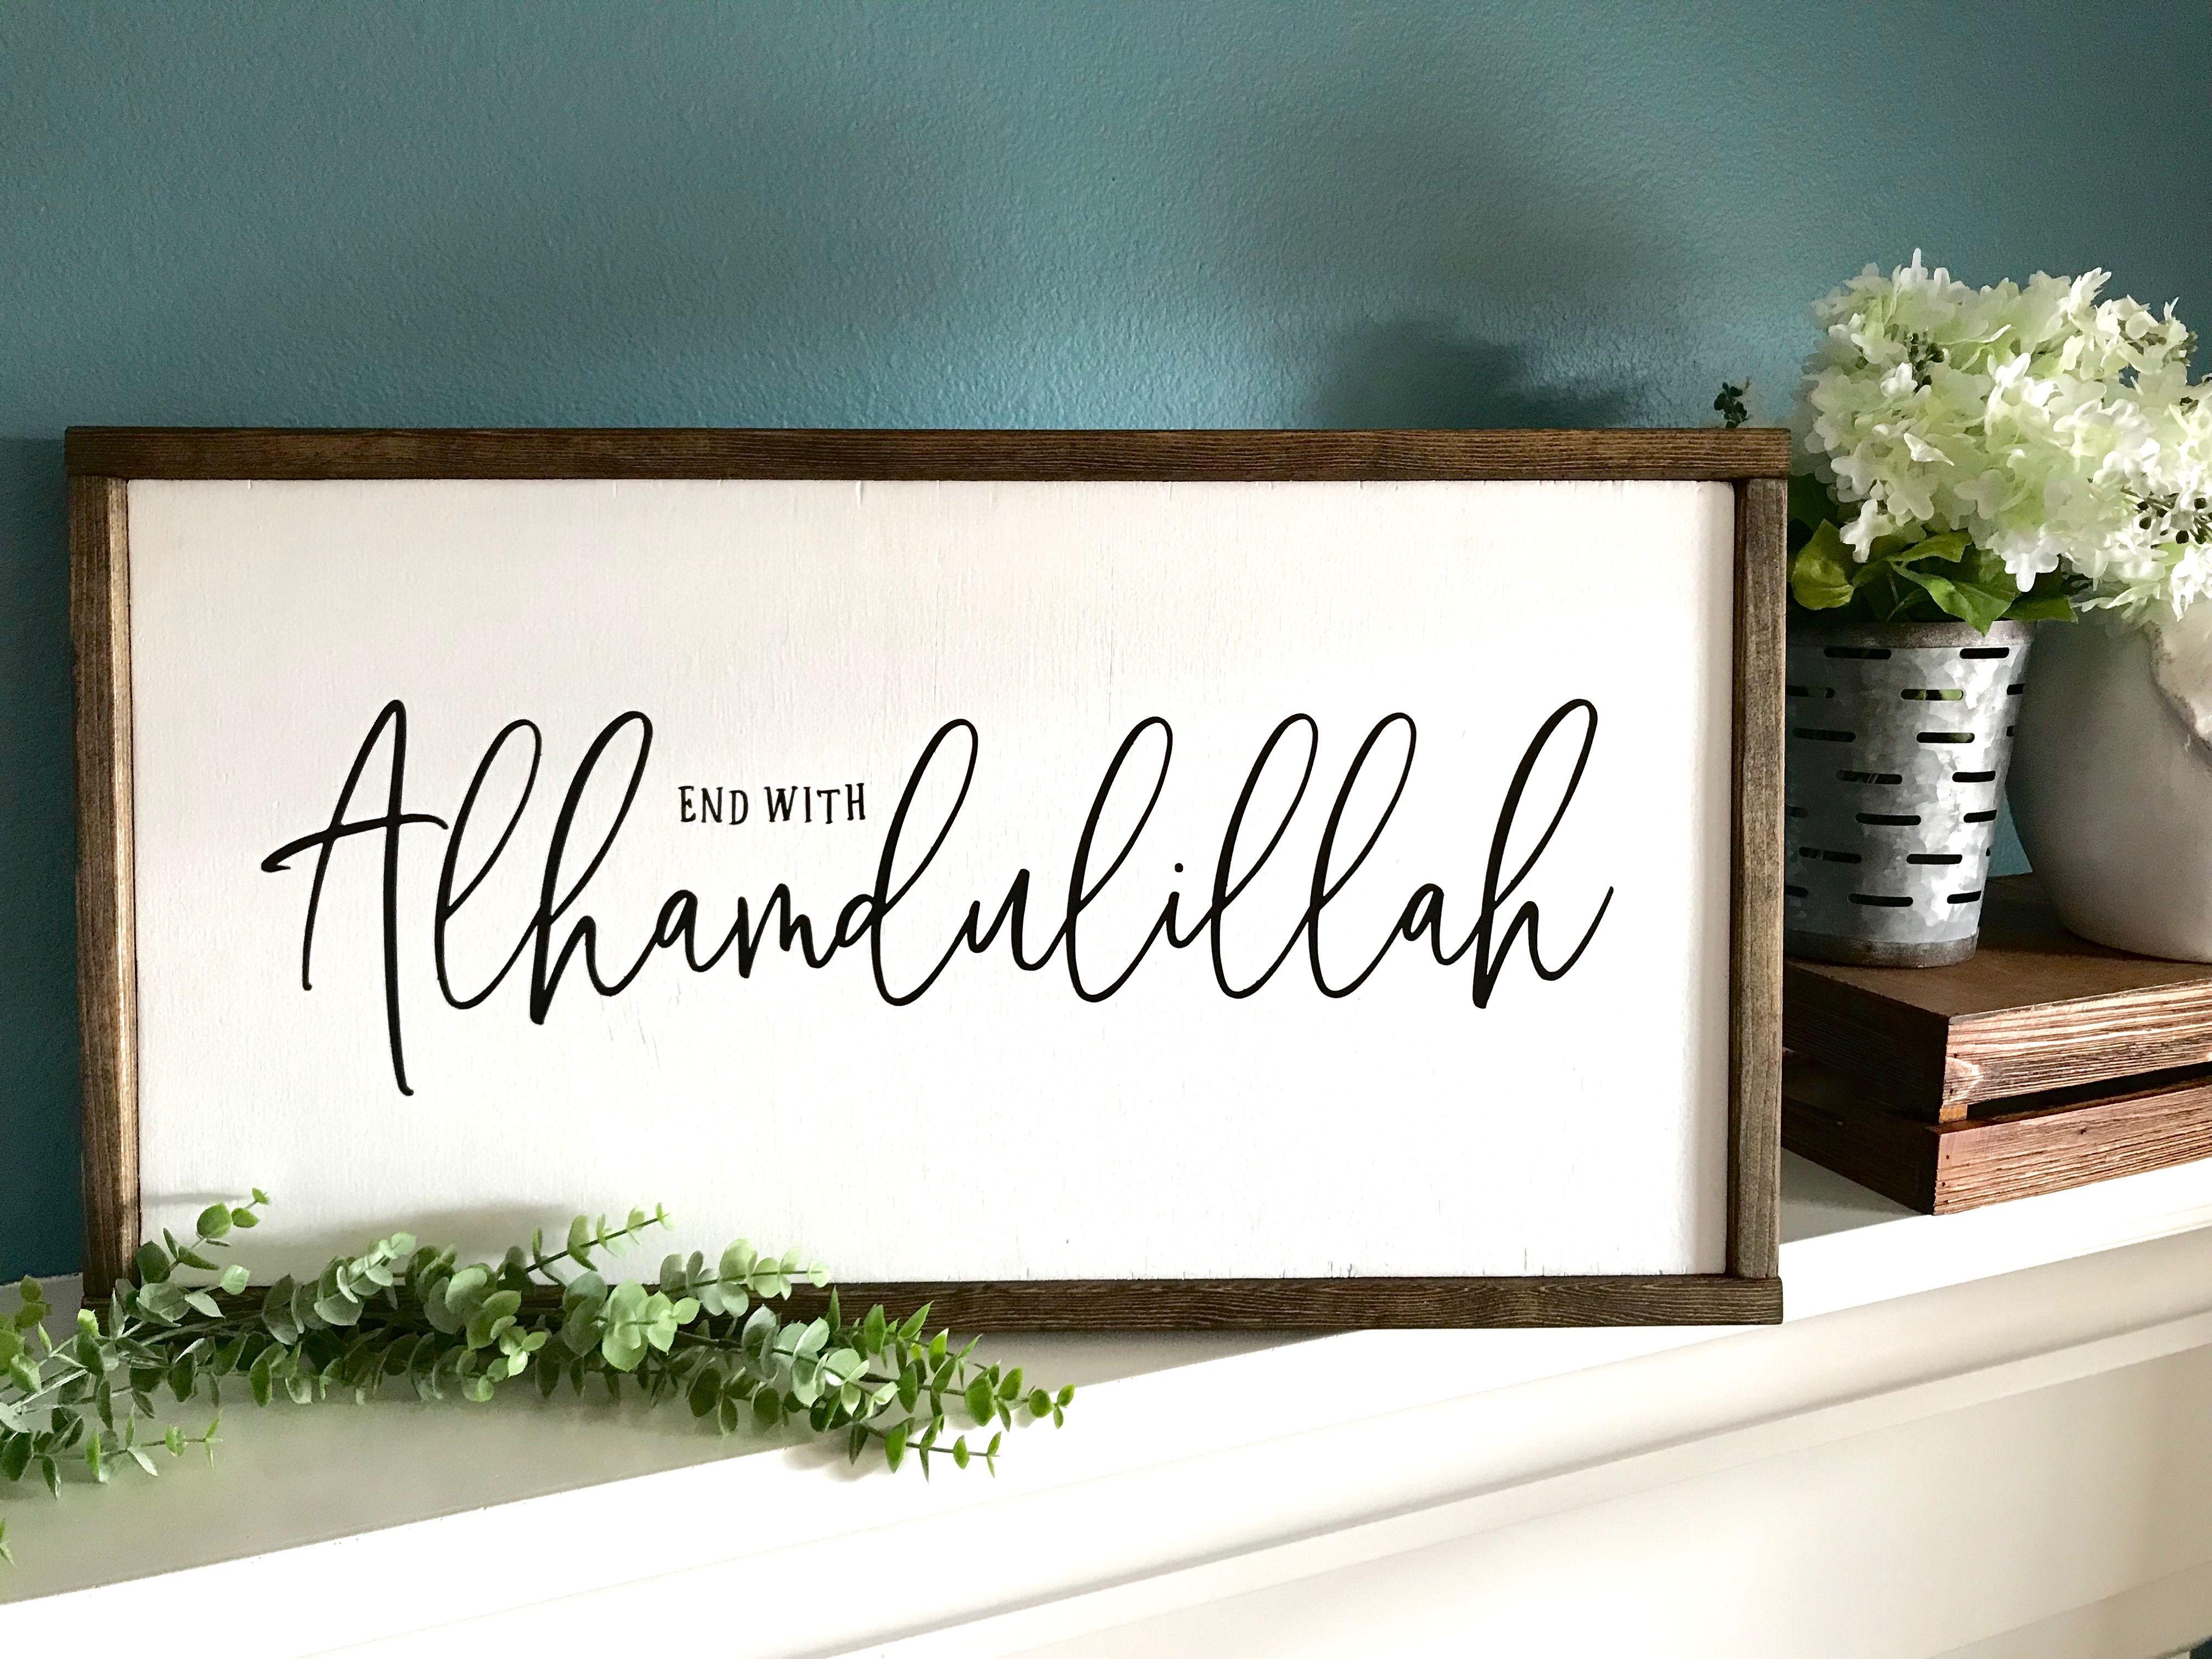 Islamic Wall Art Ramadan Eid Gifts Islamic Wood Signs Islamic Home Decor Start with Bismillah or End with Alhamdulillah 25.5 x 13.5